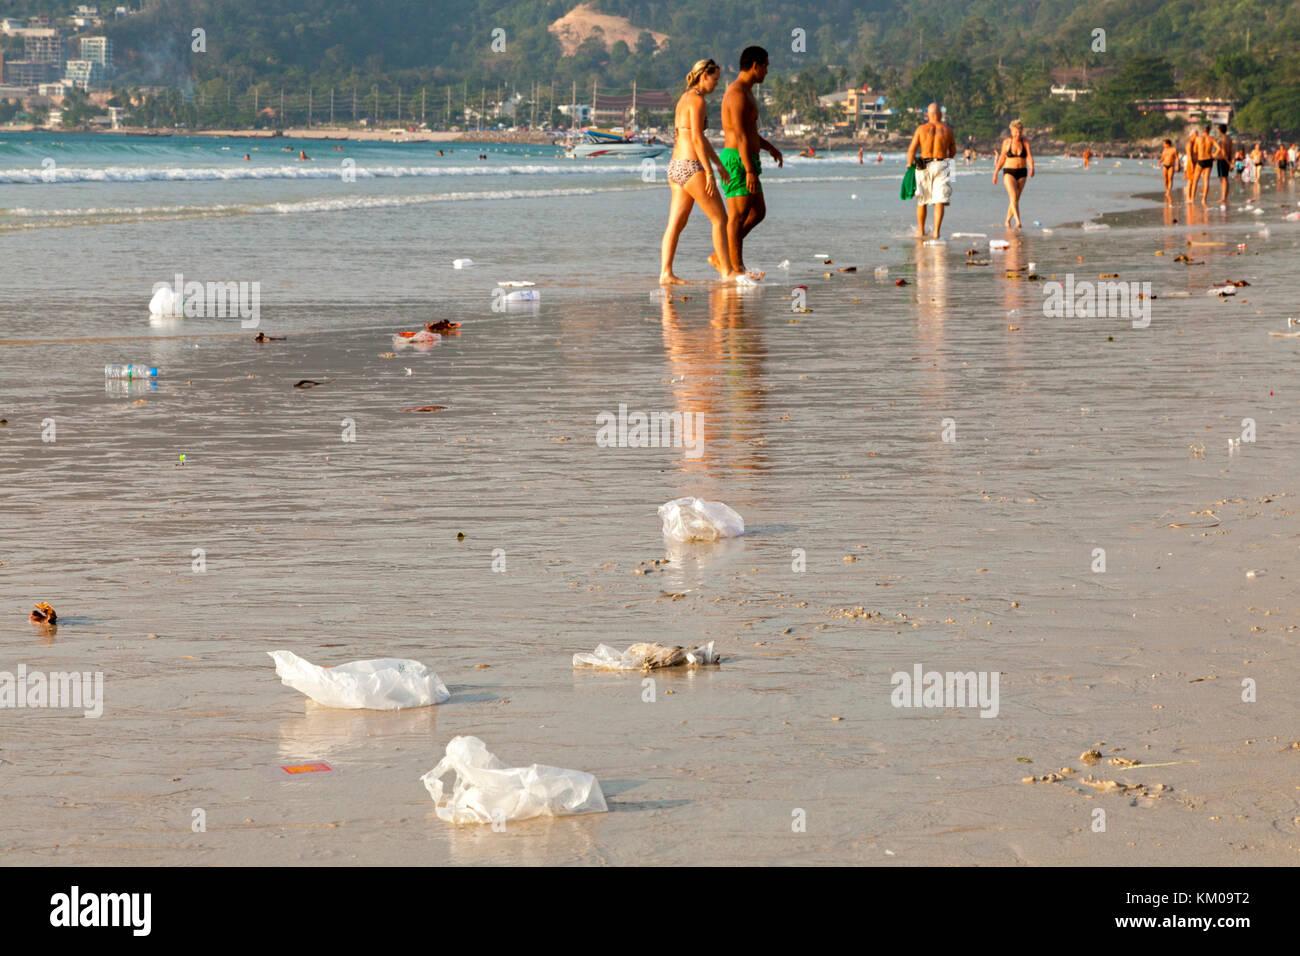 Pollution on Patong beach, Phuket, Thailand - Stock Image